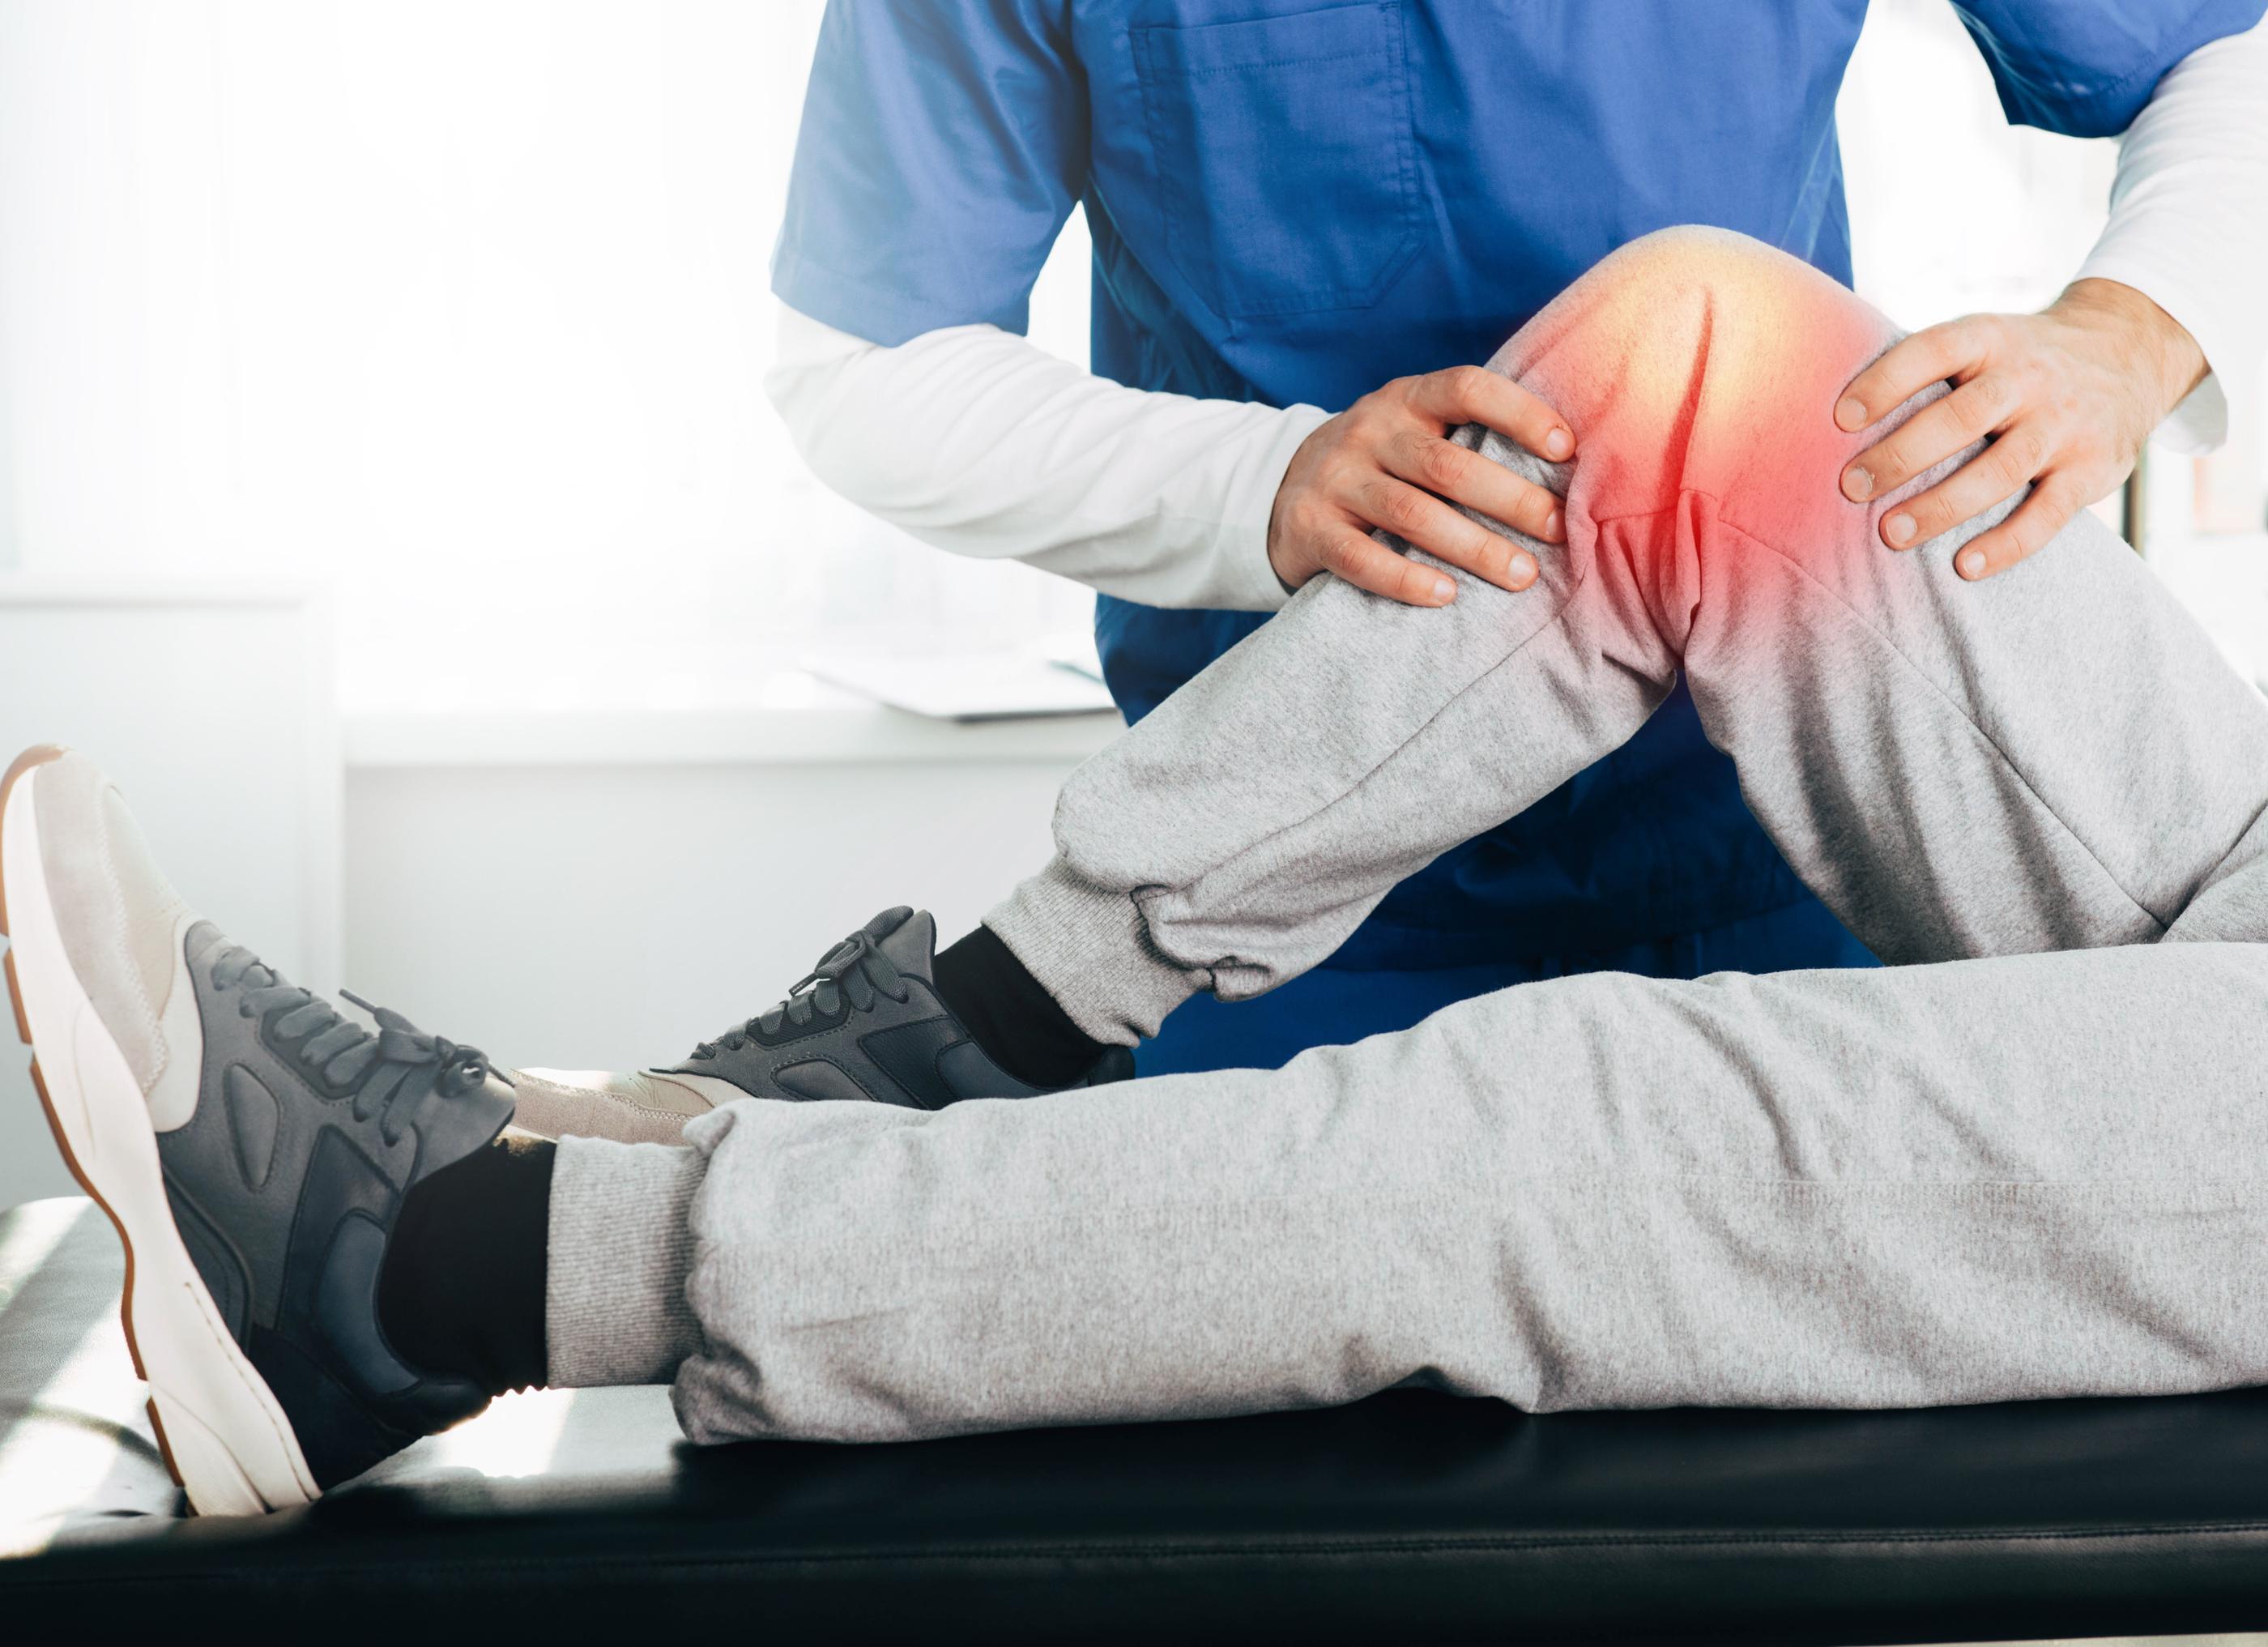 bigstock-Joint-Knee-And-Leg-Pain-Treat-3